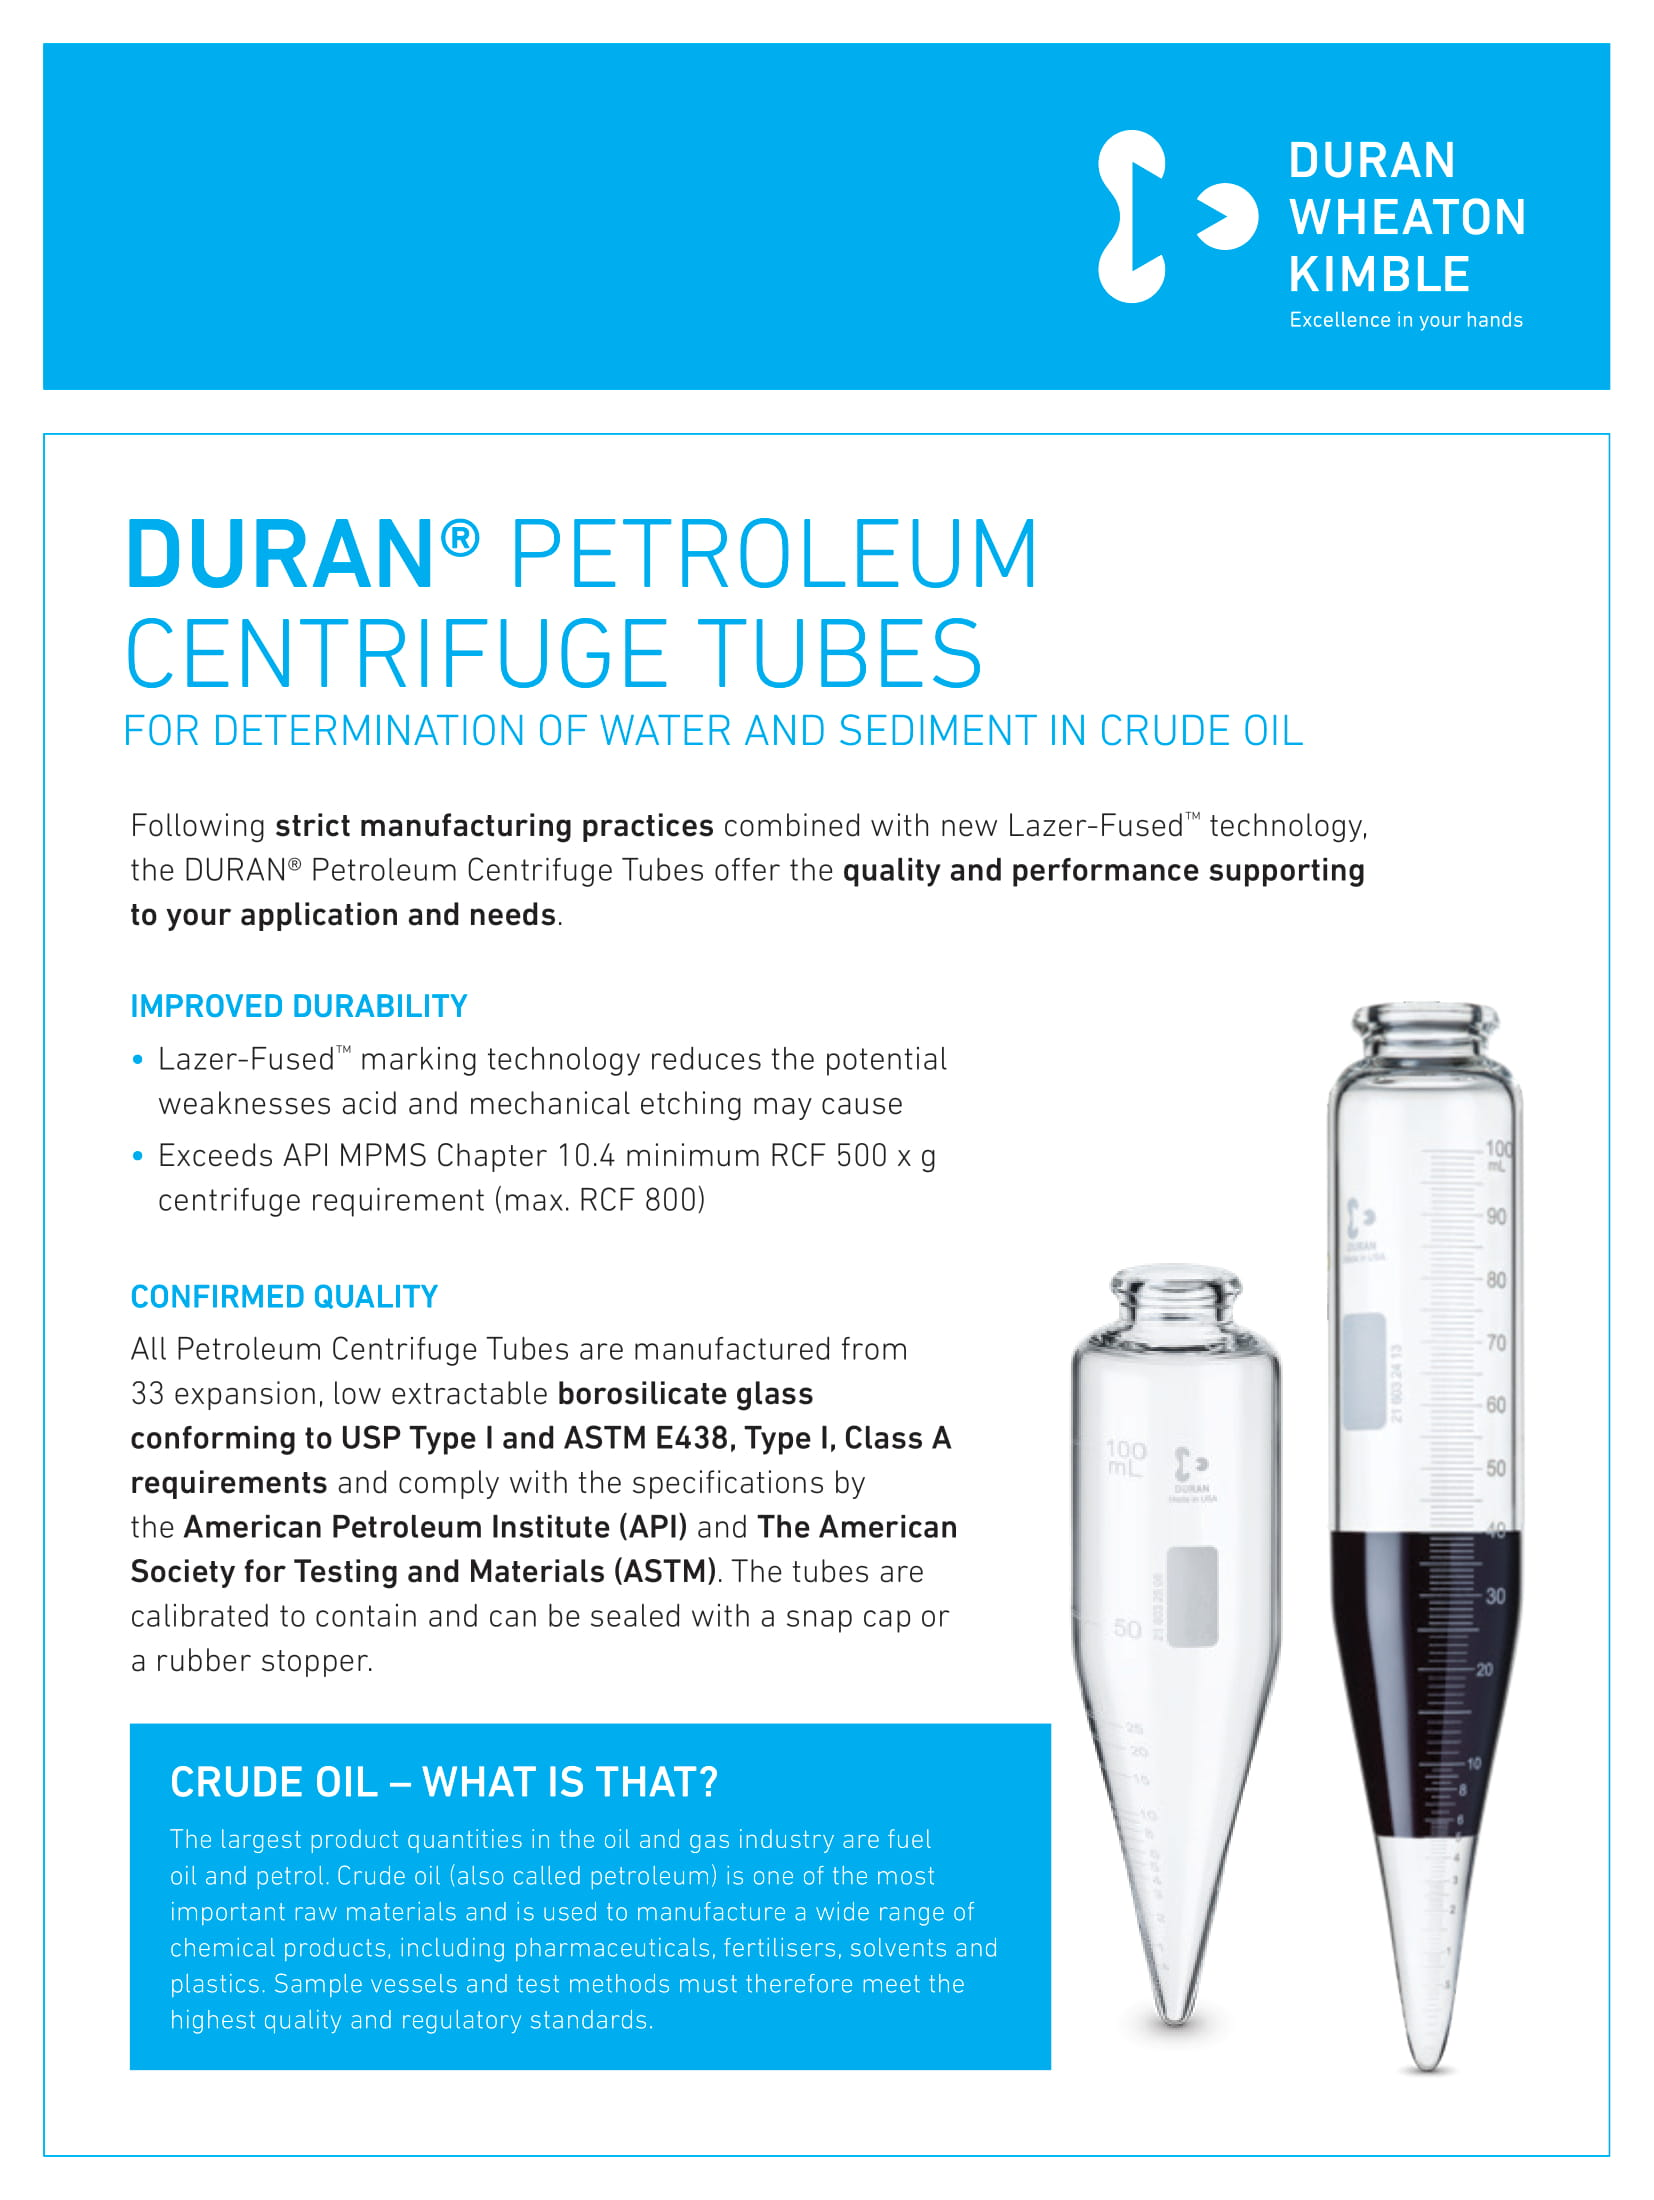 DURAN® Petroleum Centrifuge Tubes